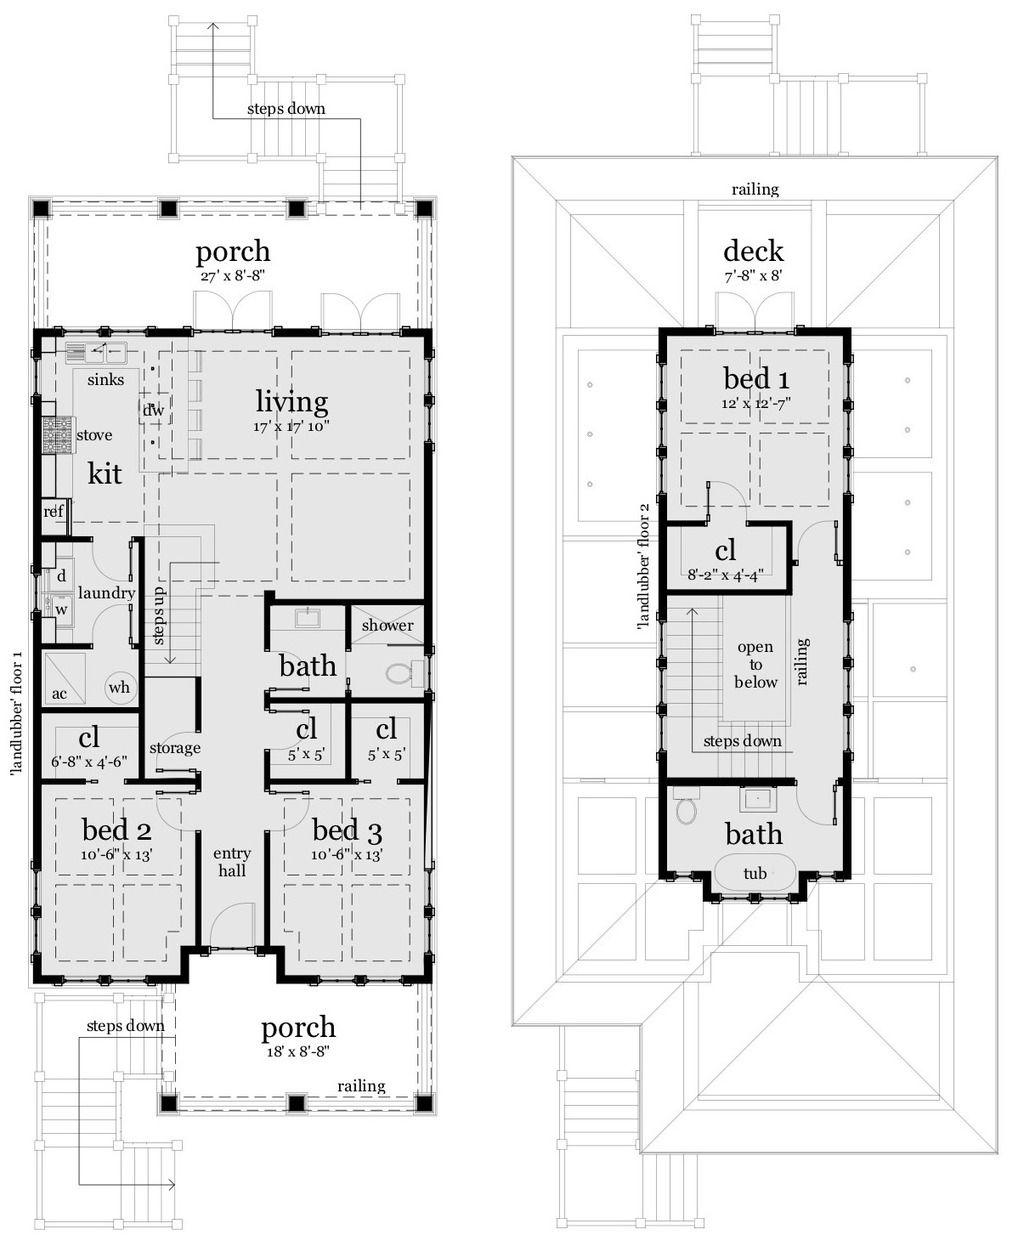 Beach style house plan 3 beds 2 baths 1581 sqft plan 64